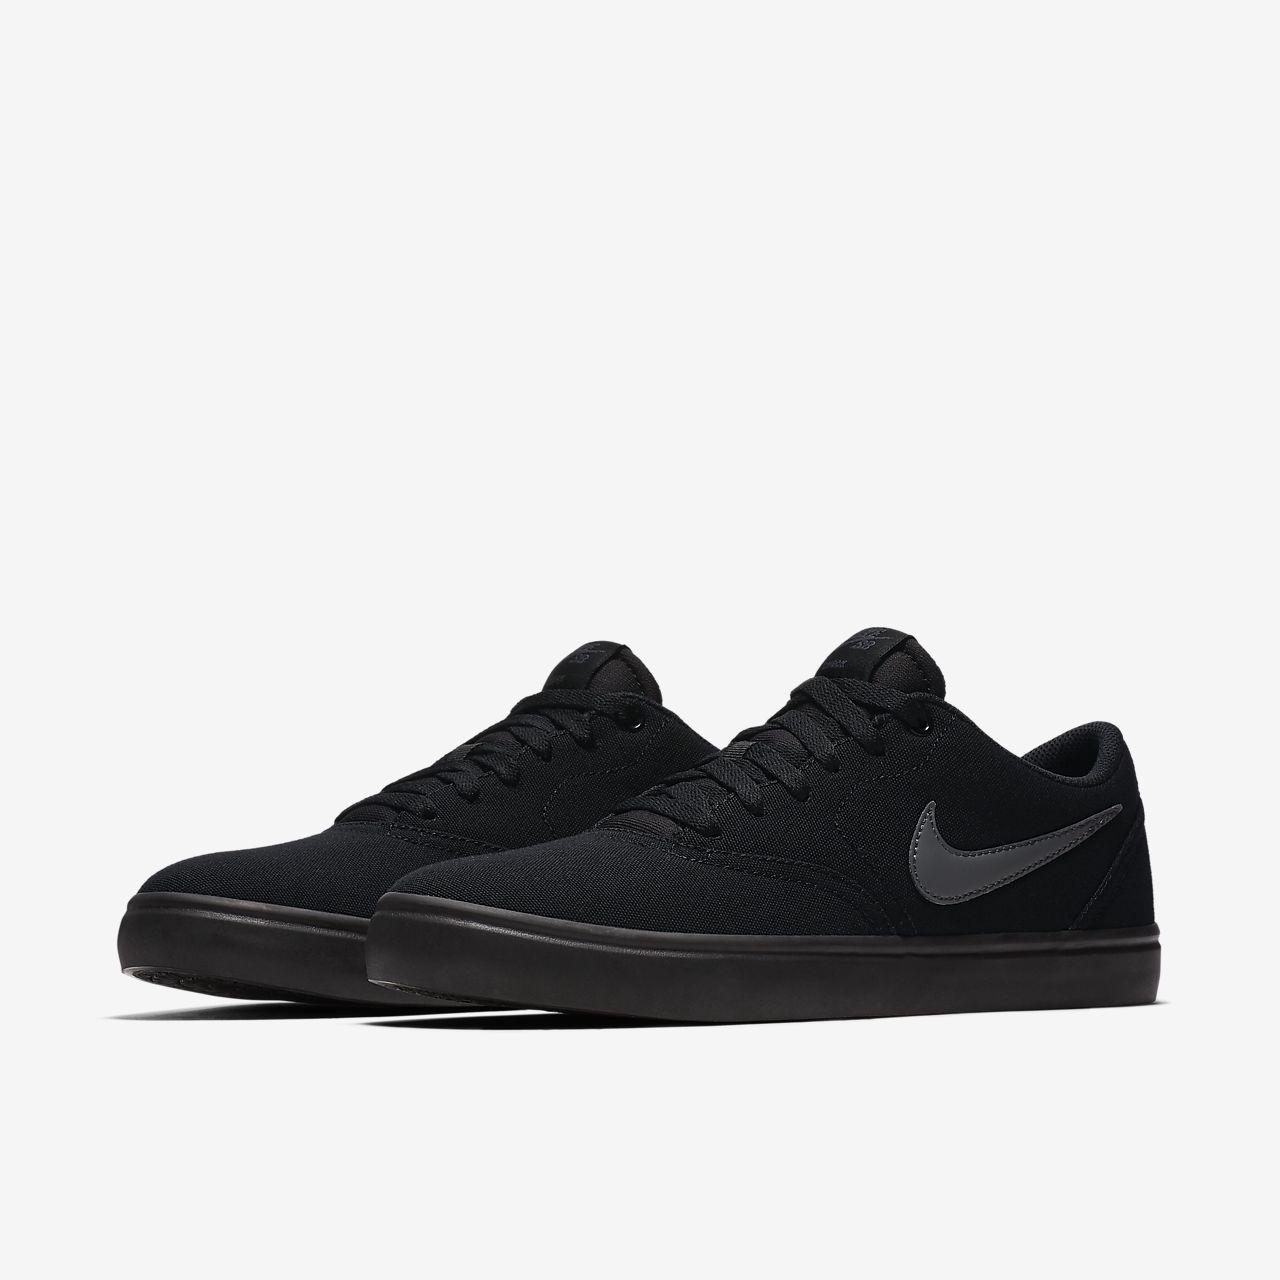 76b53df4d25306 Nike SB Check Solarsoft Canvas Herren-Skateboardschuh. Nike.com DE